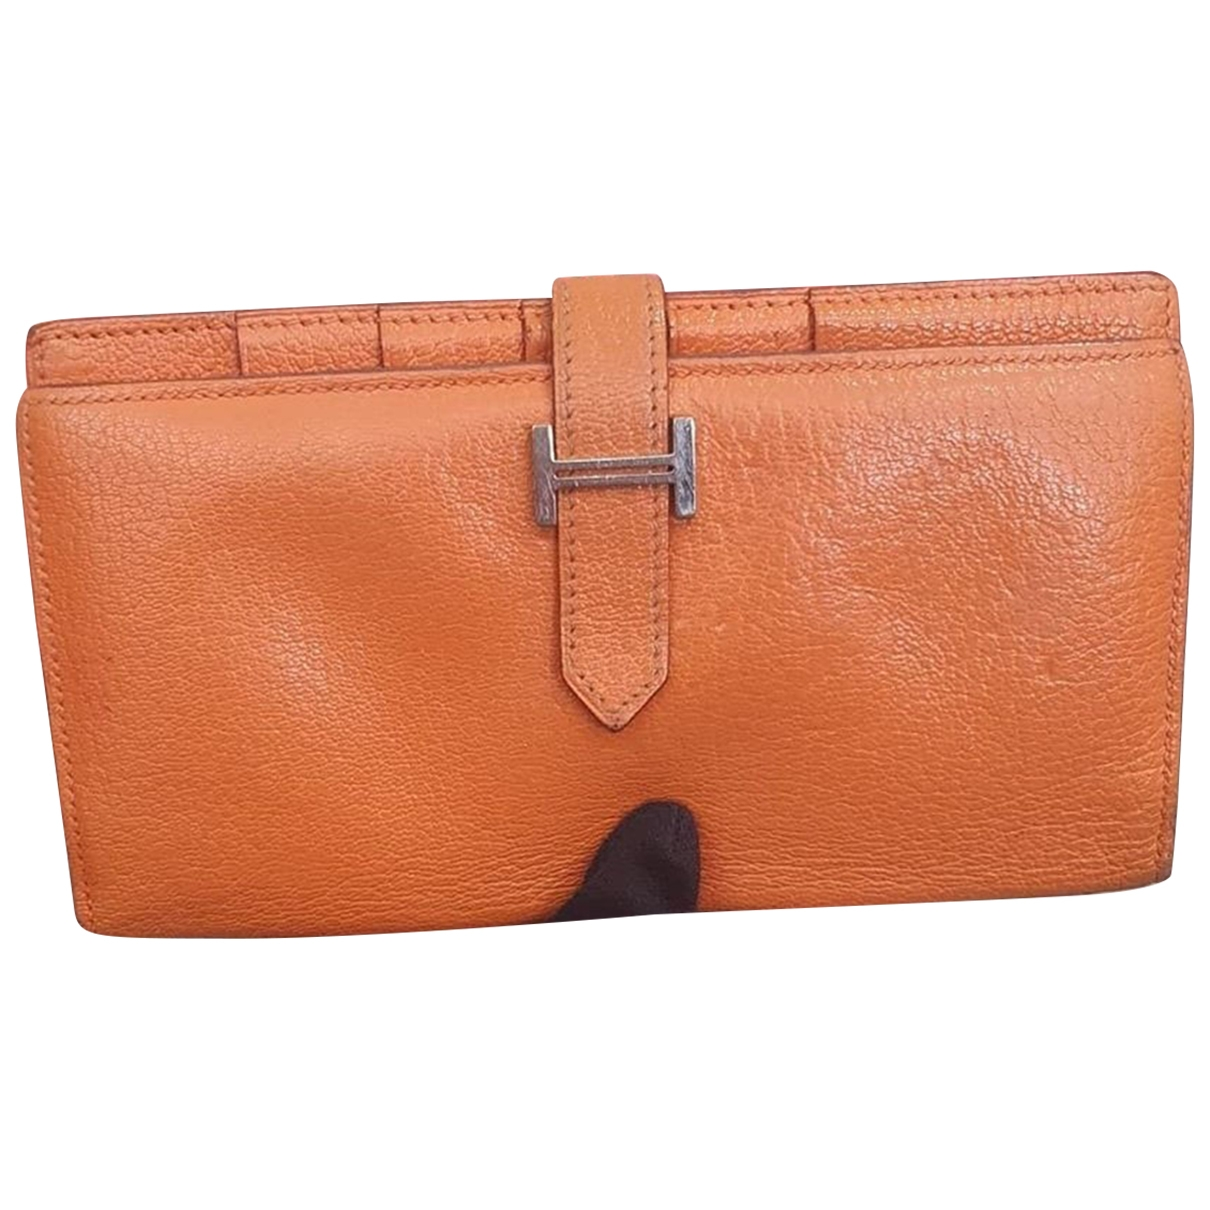 Hermes - Portefeuille Bearn pour femme en cuir - orange